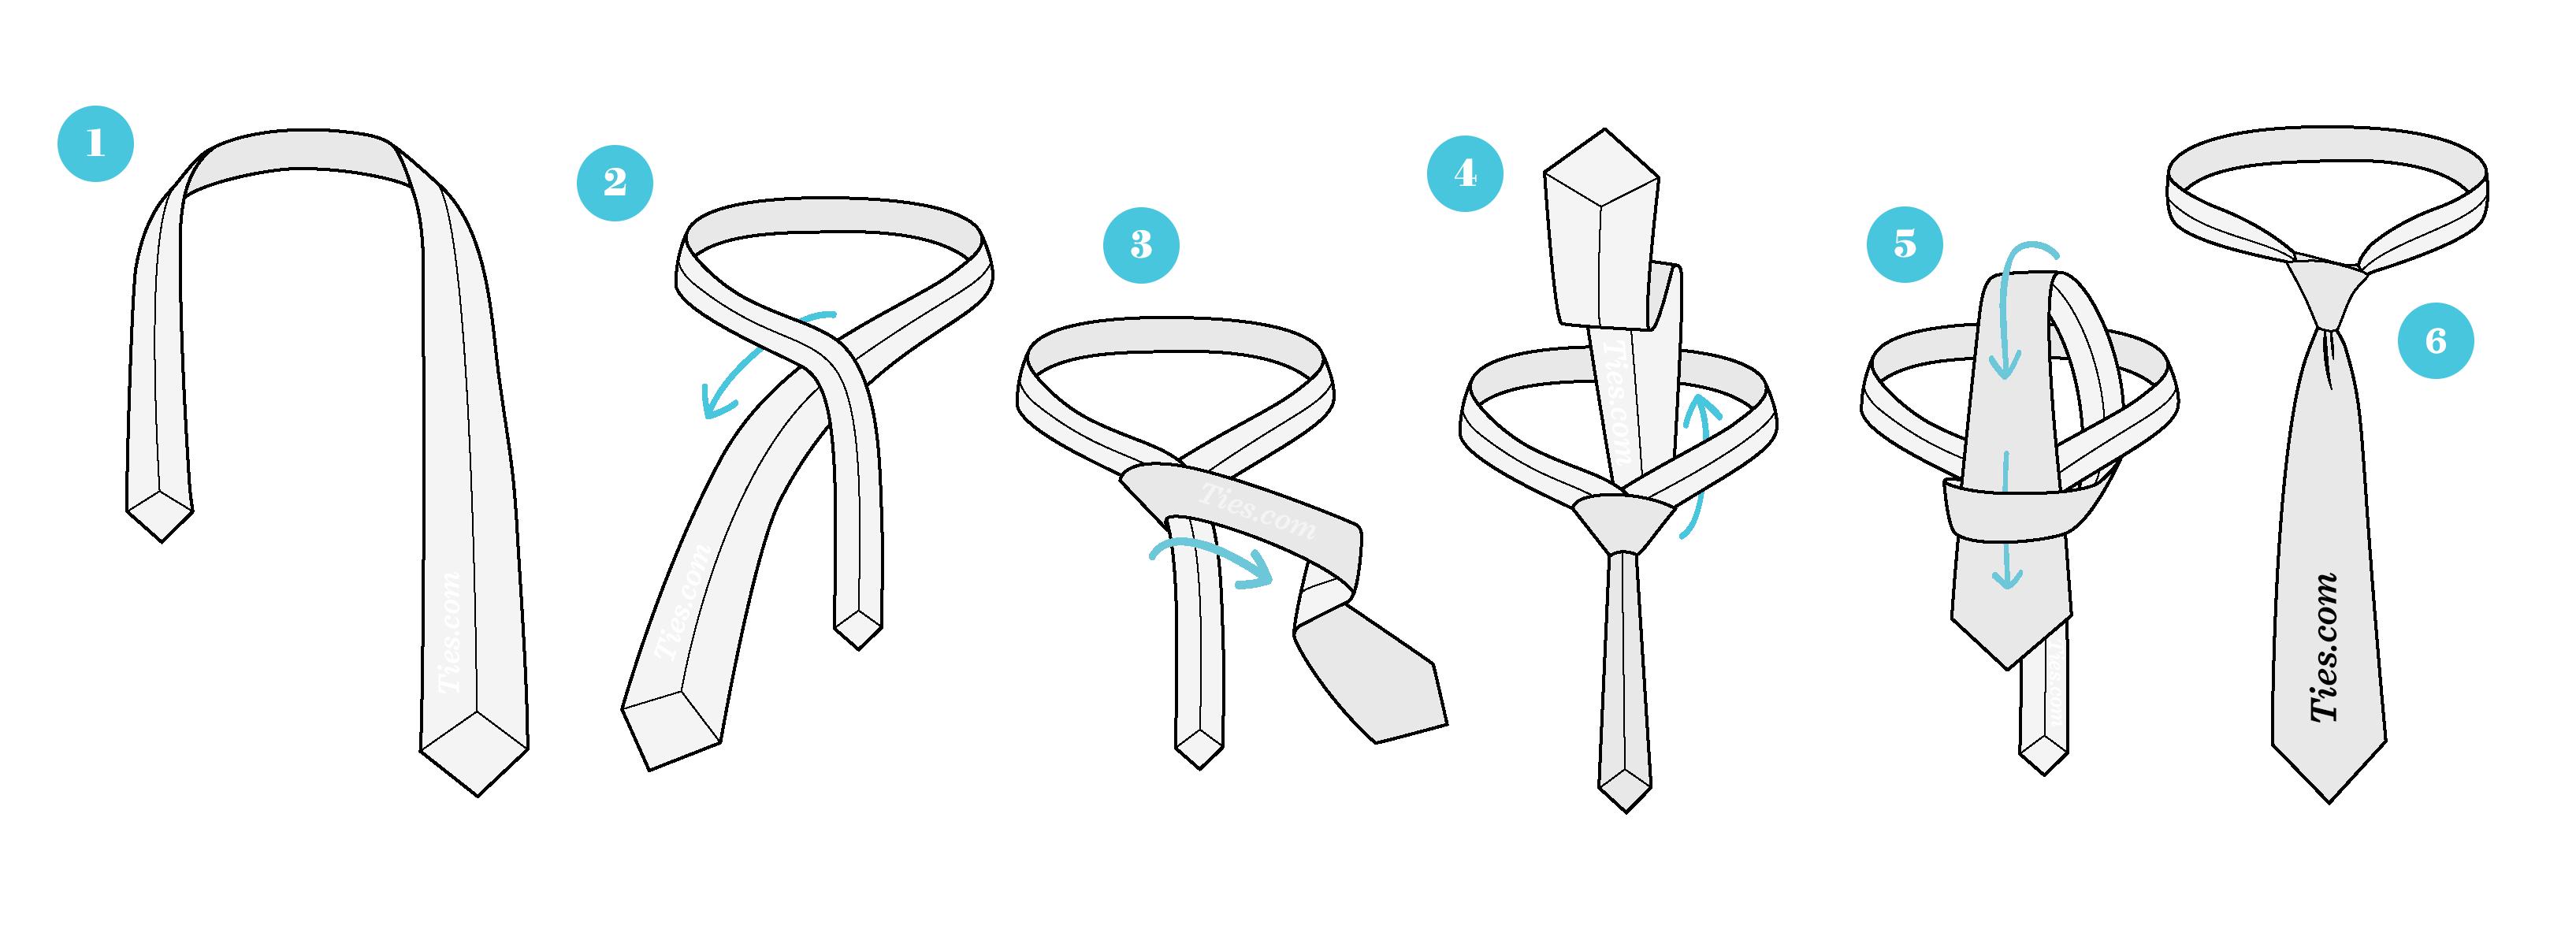 no-gravata-simples-oriental